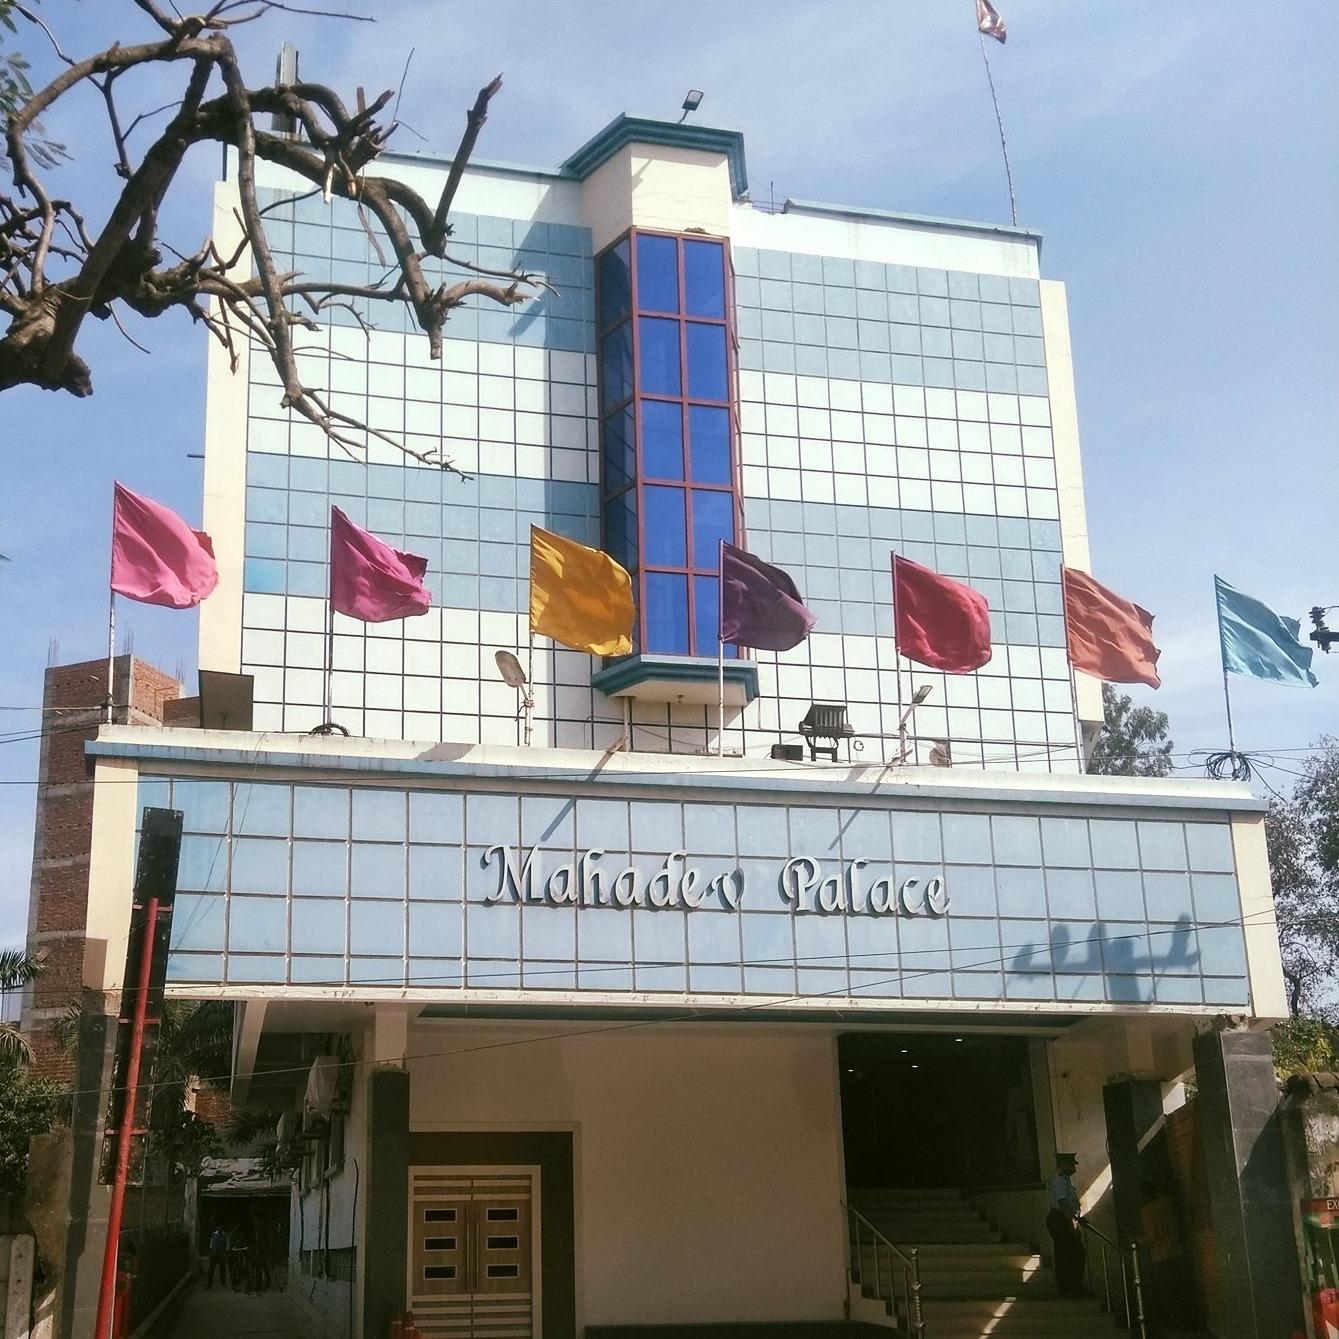 Hotel To Stay Near Baba Baidyanath Temple in Deoghar-Hotel Mahadev Palace